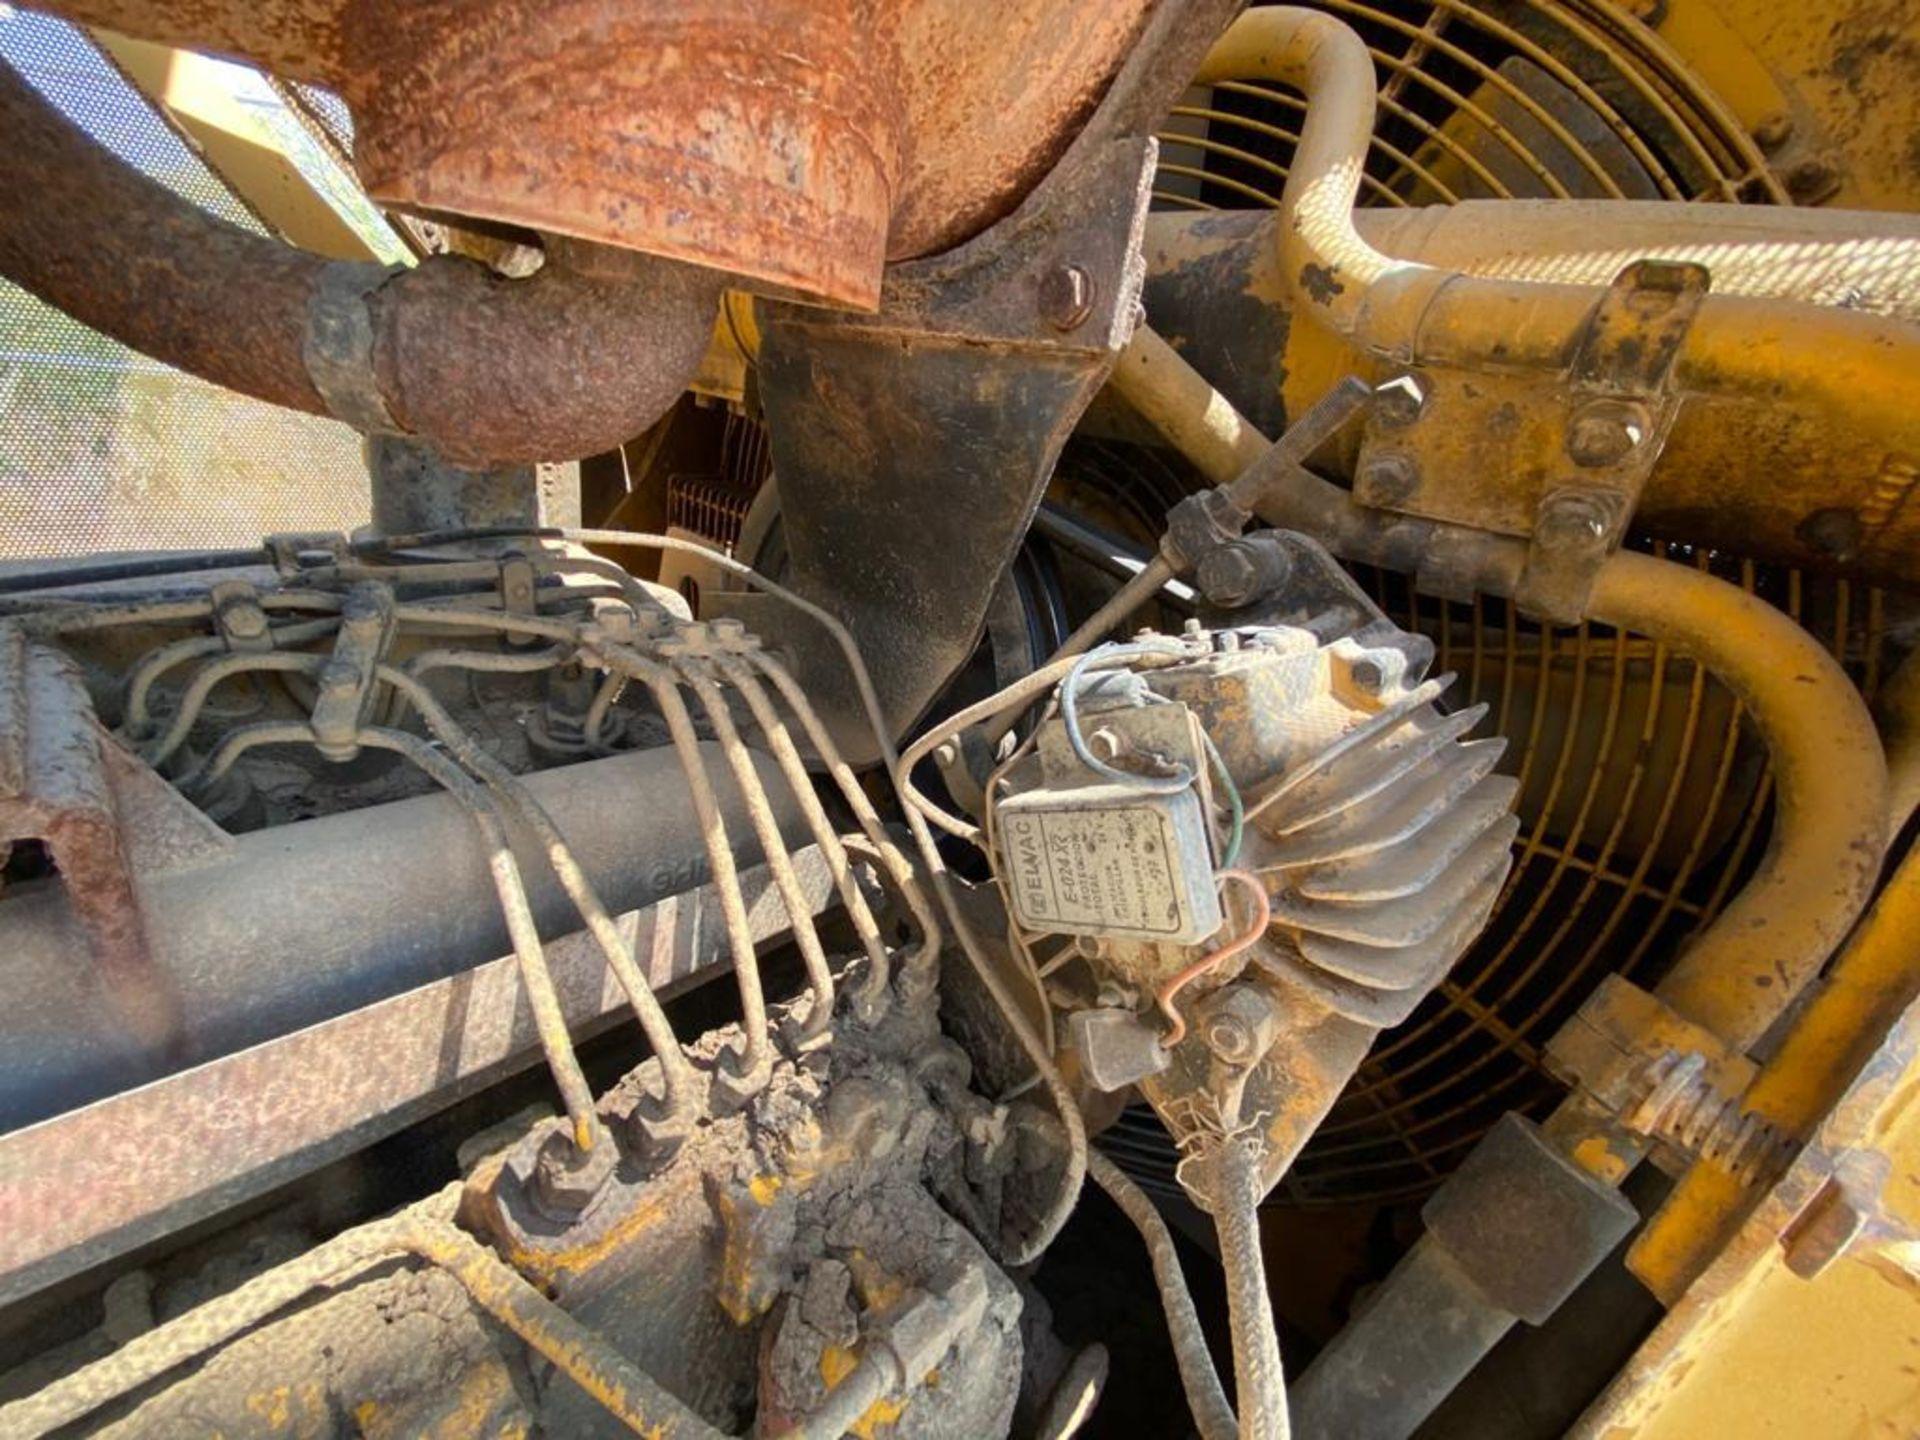 Caterpillar D7G Bulldozer, Serial number 92V5897, Diesel motor - Image 39 of 48